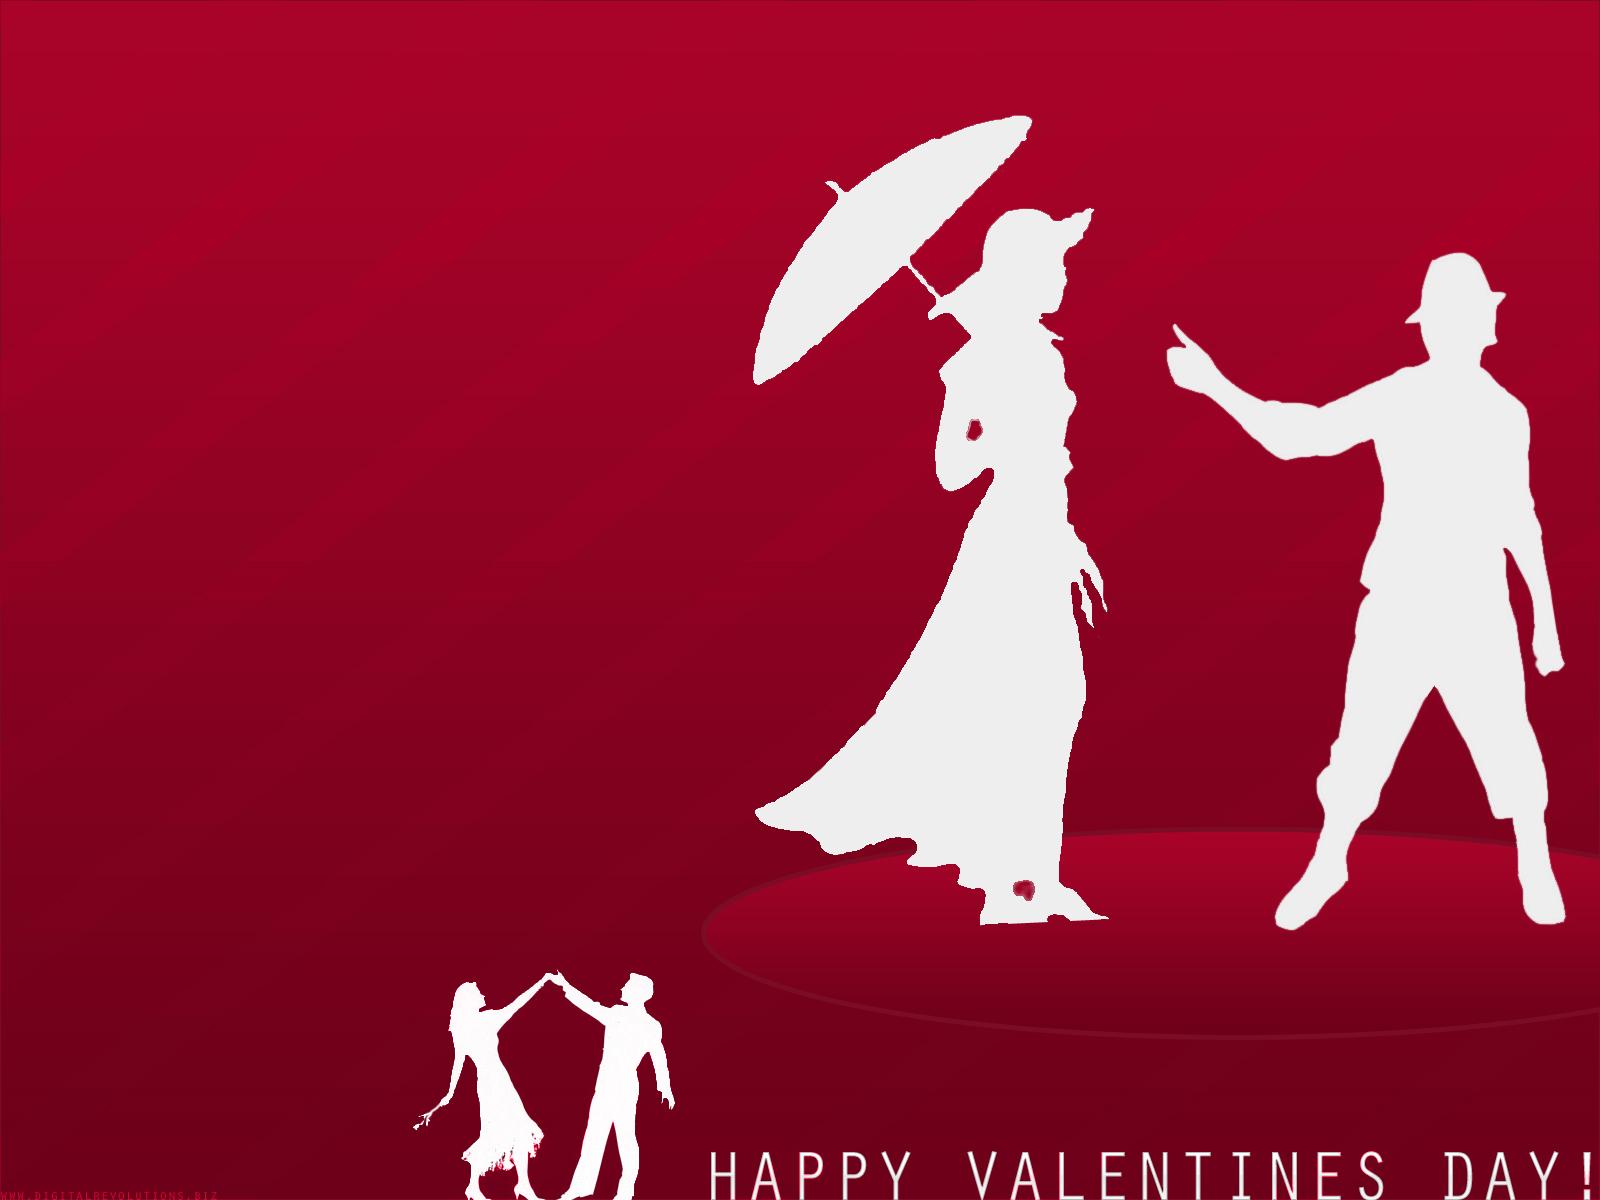 Valentine Day Wallpaper - WallpaperSafari